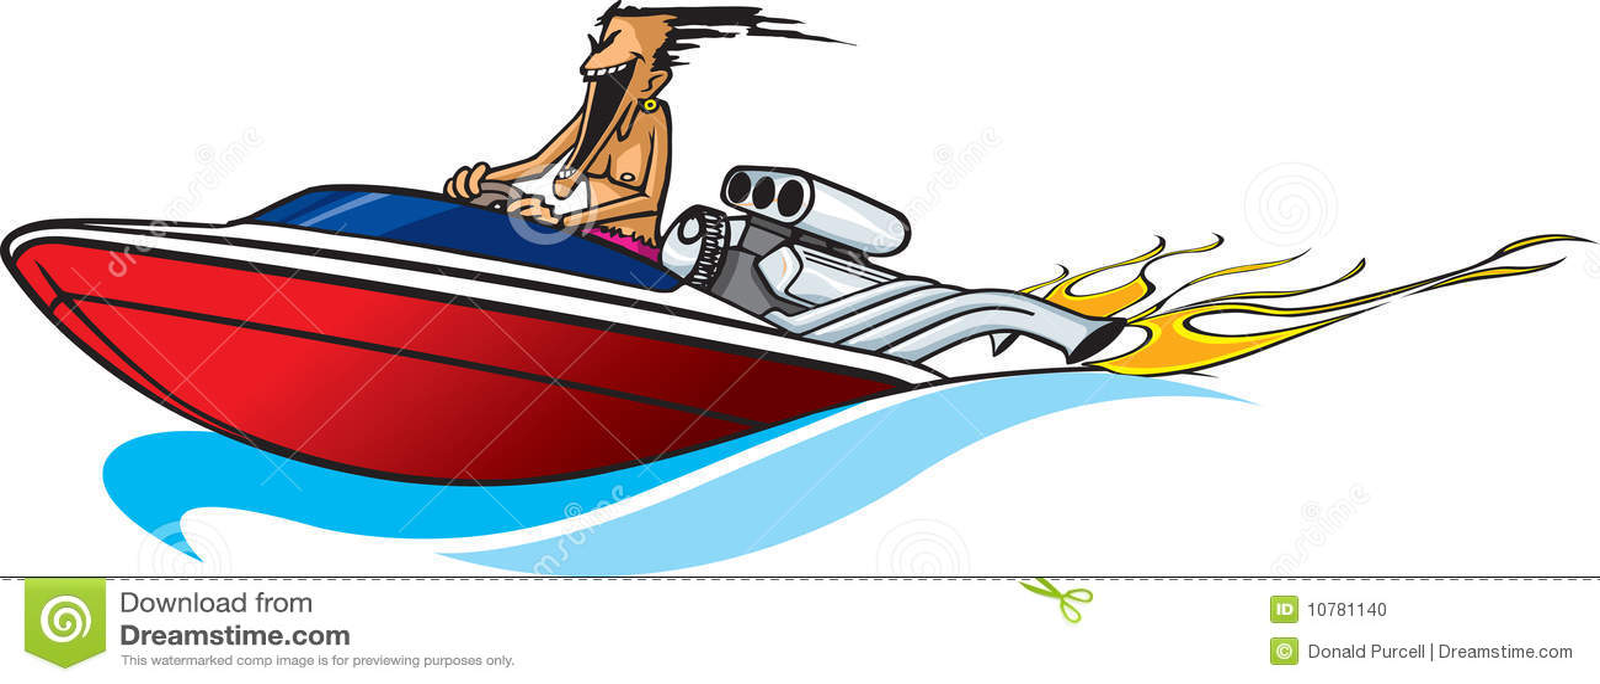 Fishing Boat Cartoon Speed boat maniac stoc...